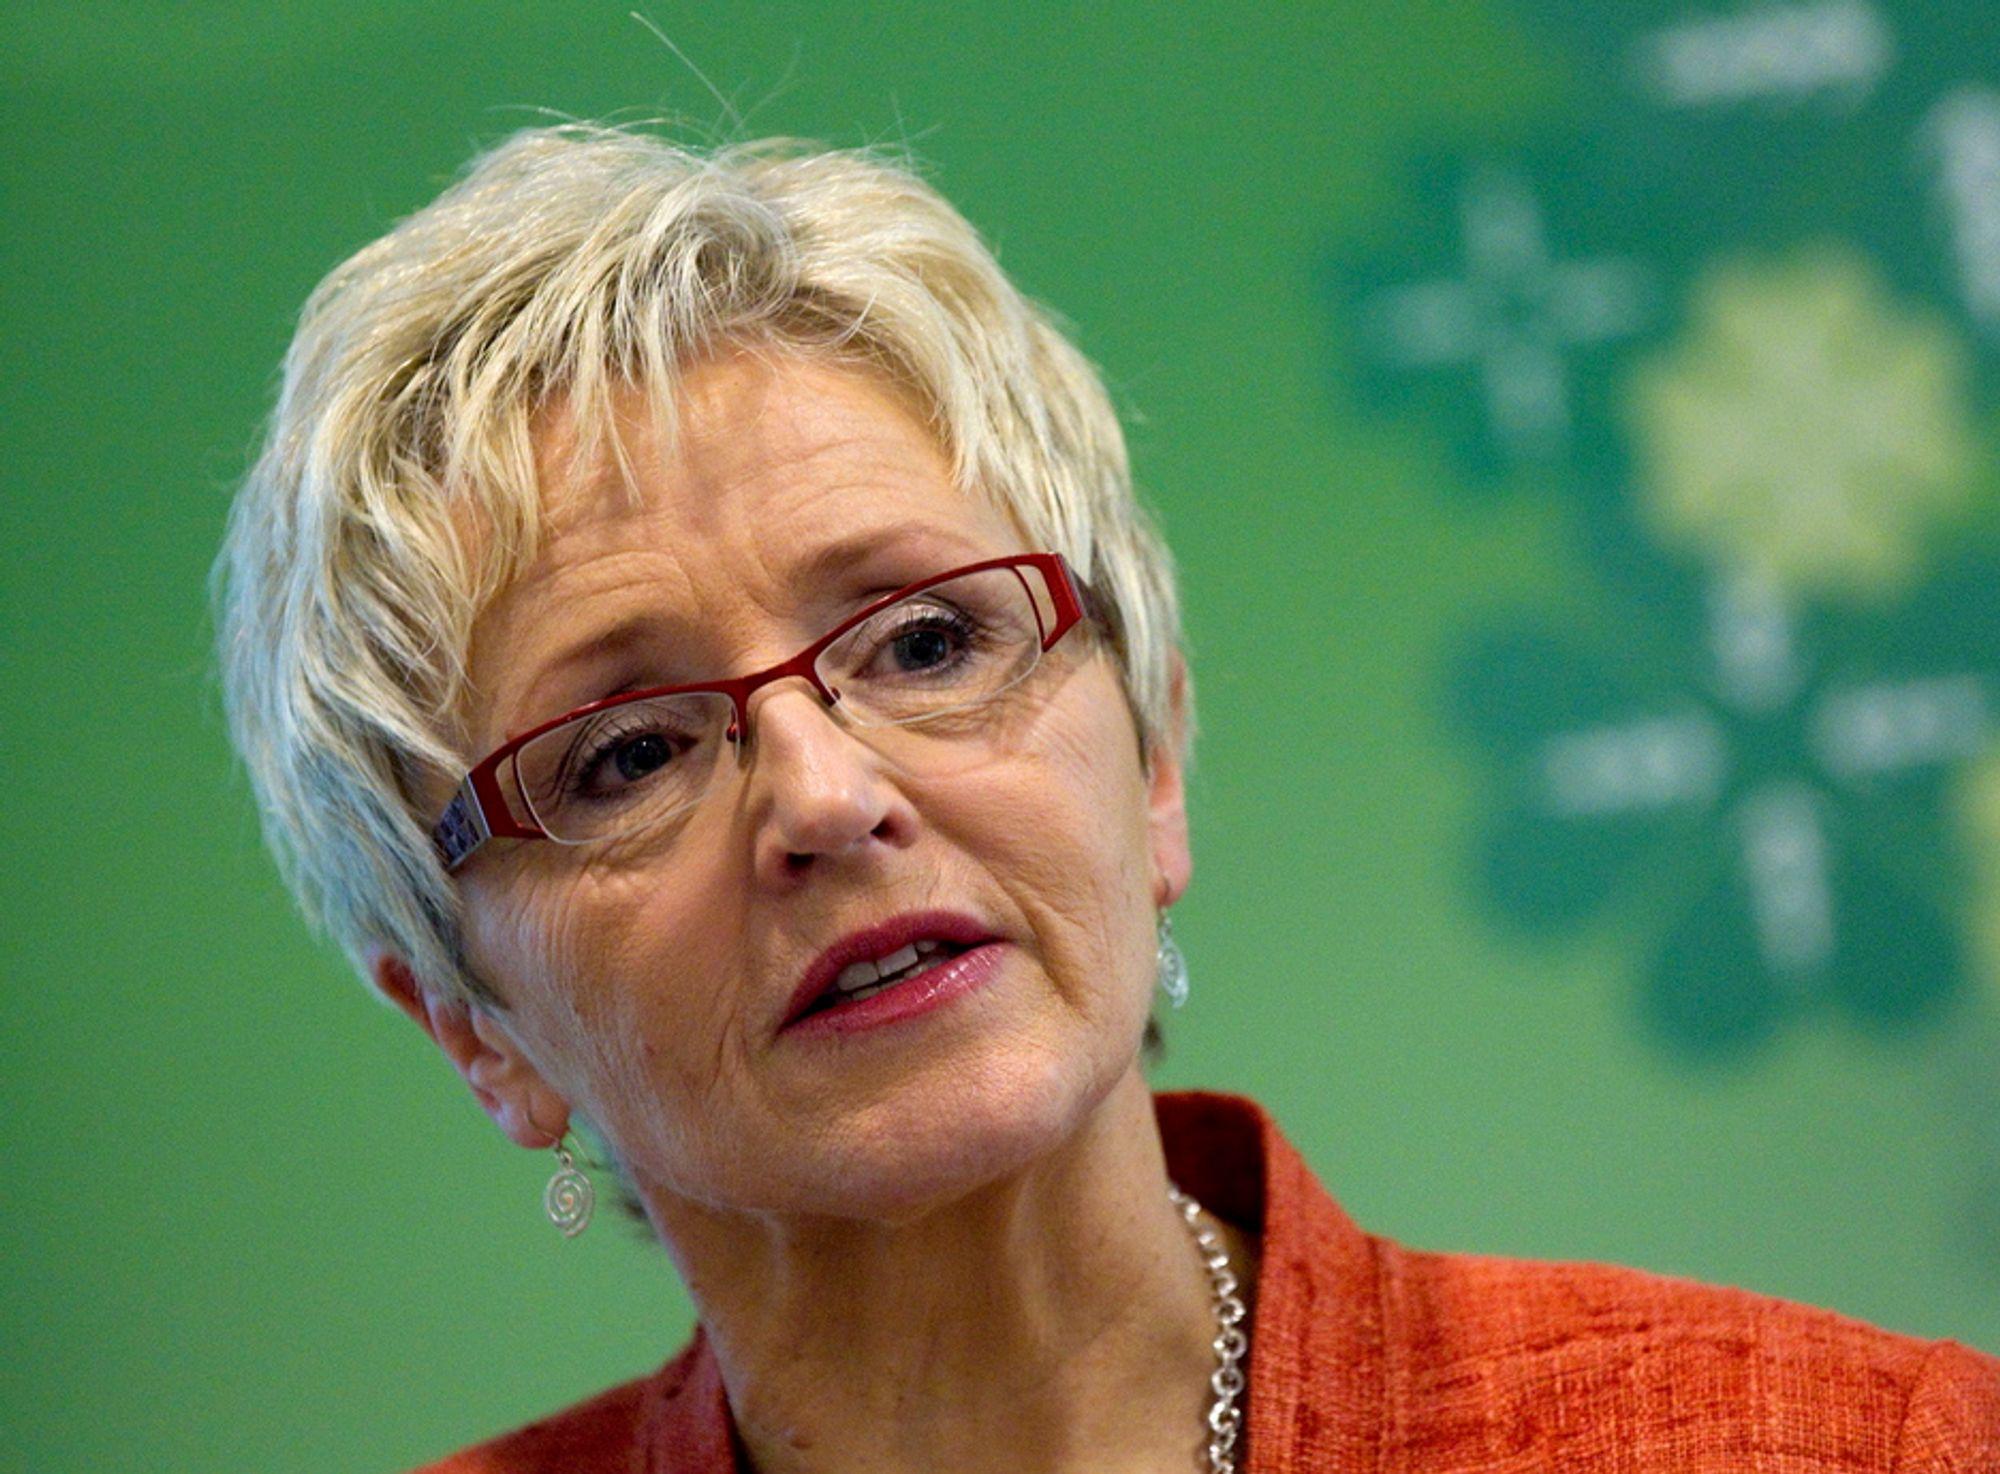 LOVER STØTTE: Kommunalminister Liv Signe Navarsete.